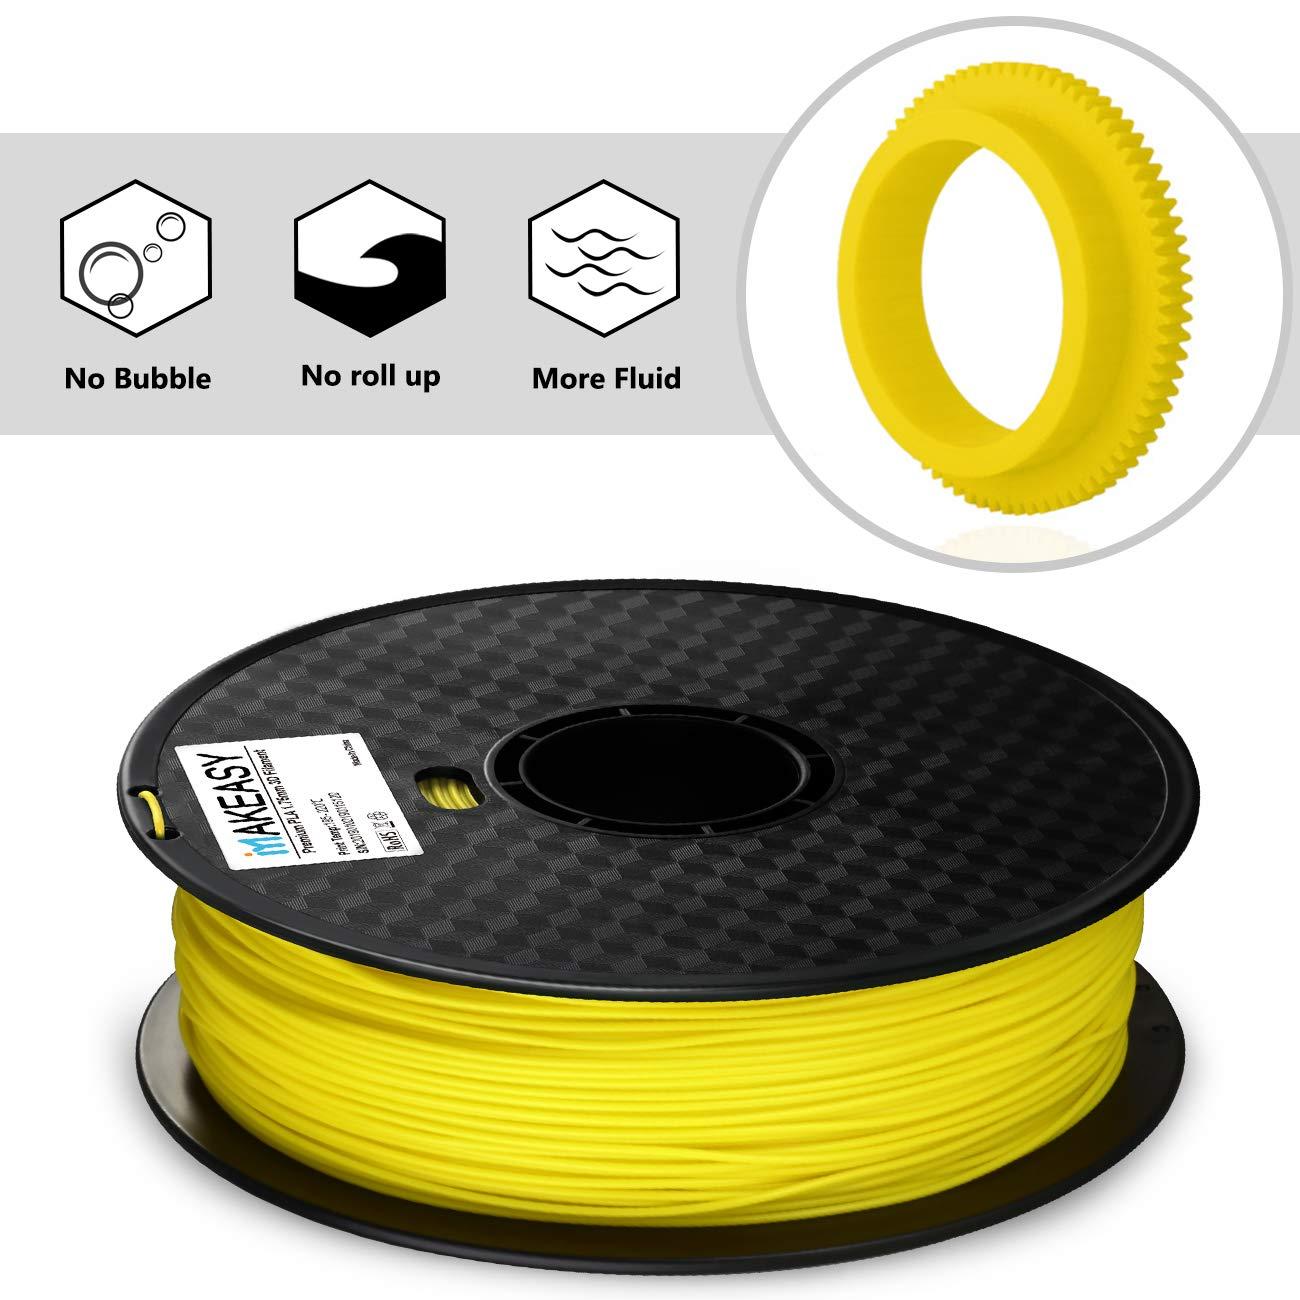 1 kg Spool Yellow Premium PLA MAKEASY 3D PLA Filament 1.75 mm for 3D Printer No Tangling Issue /& No Extruder Clogging